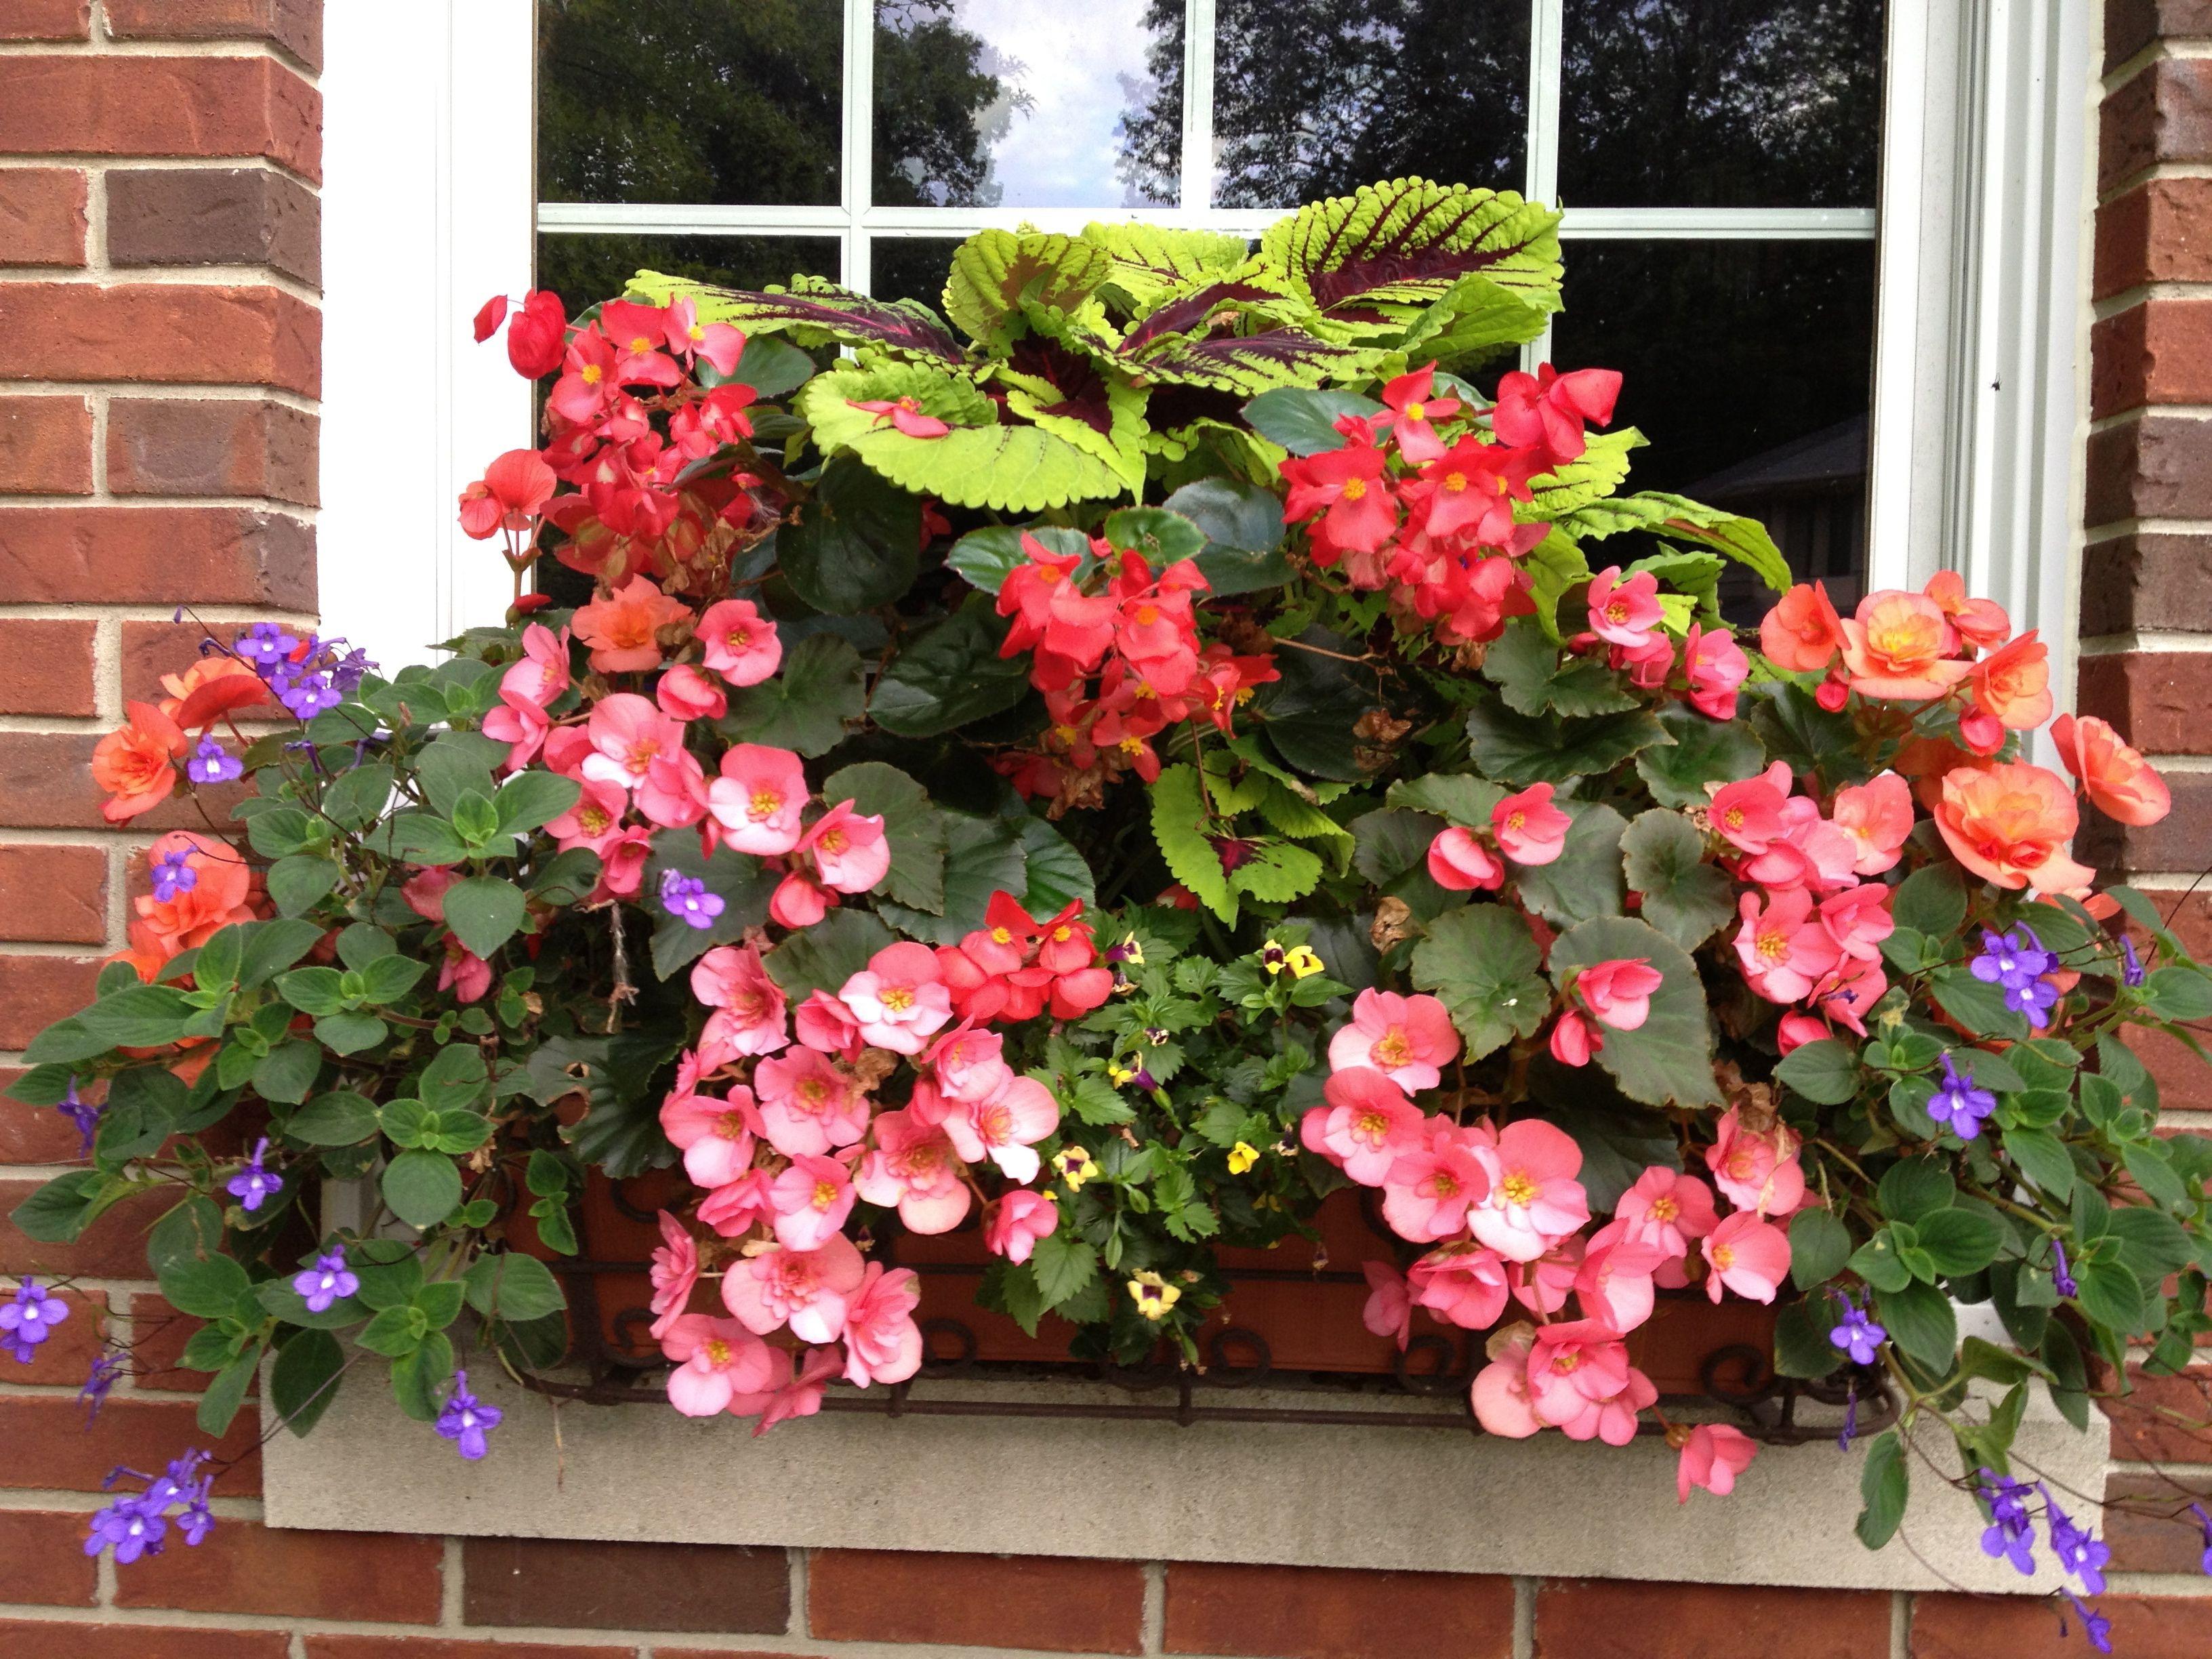 Annabelle Hydrangea Wax Begonia Garden Design Drifts Of Color Www Sarahscottagecreations Com Landscaping Images Garden Design Front Yard Landscaping